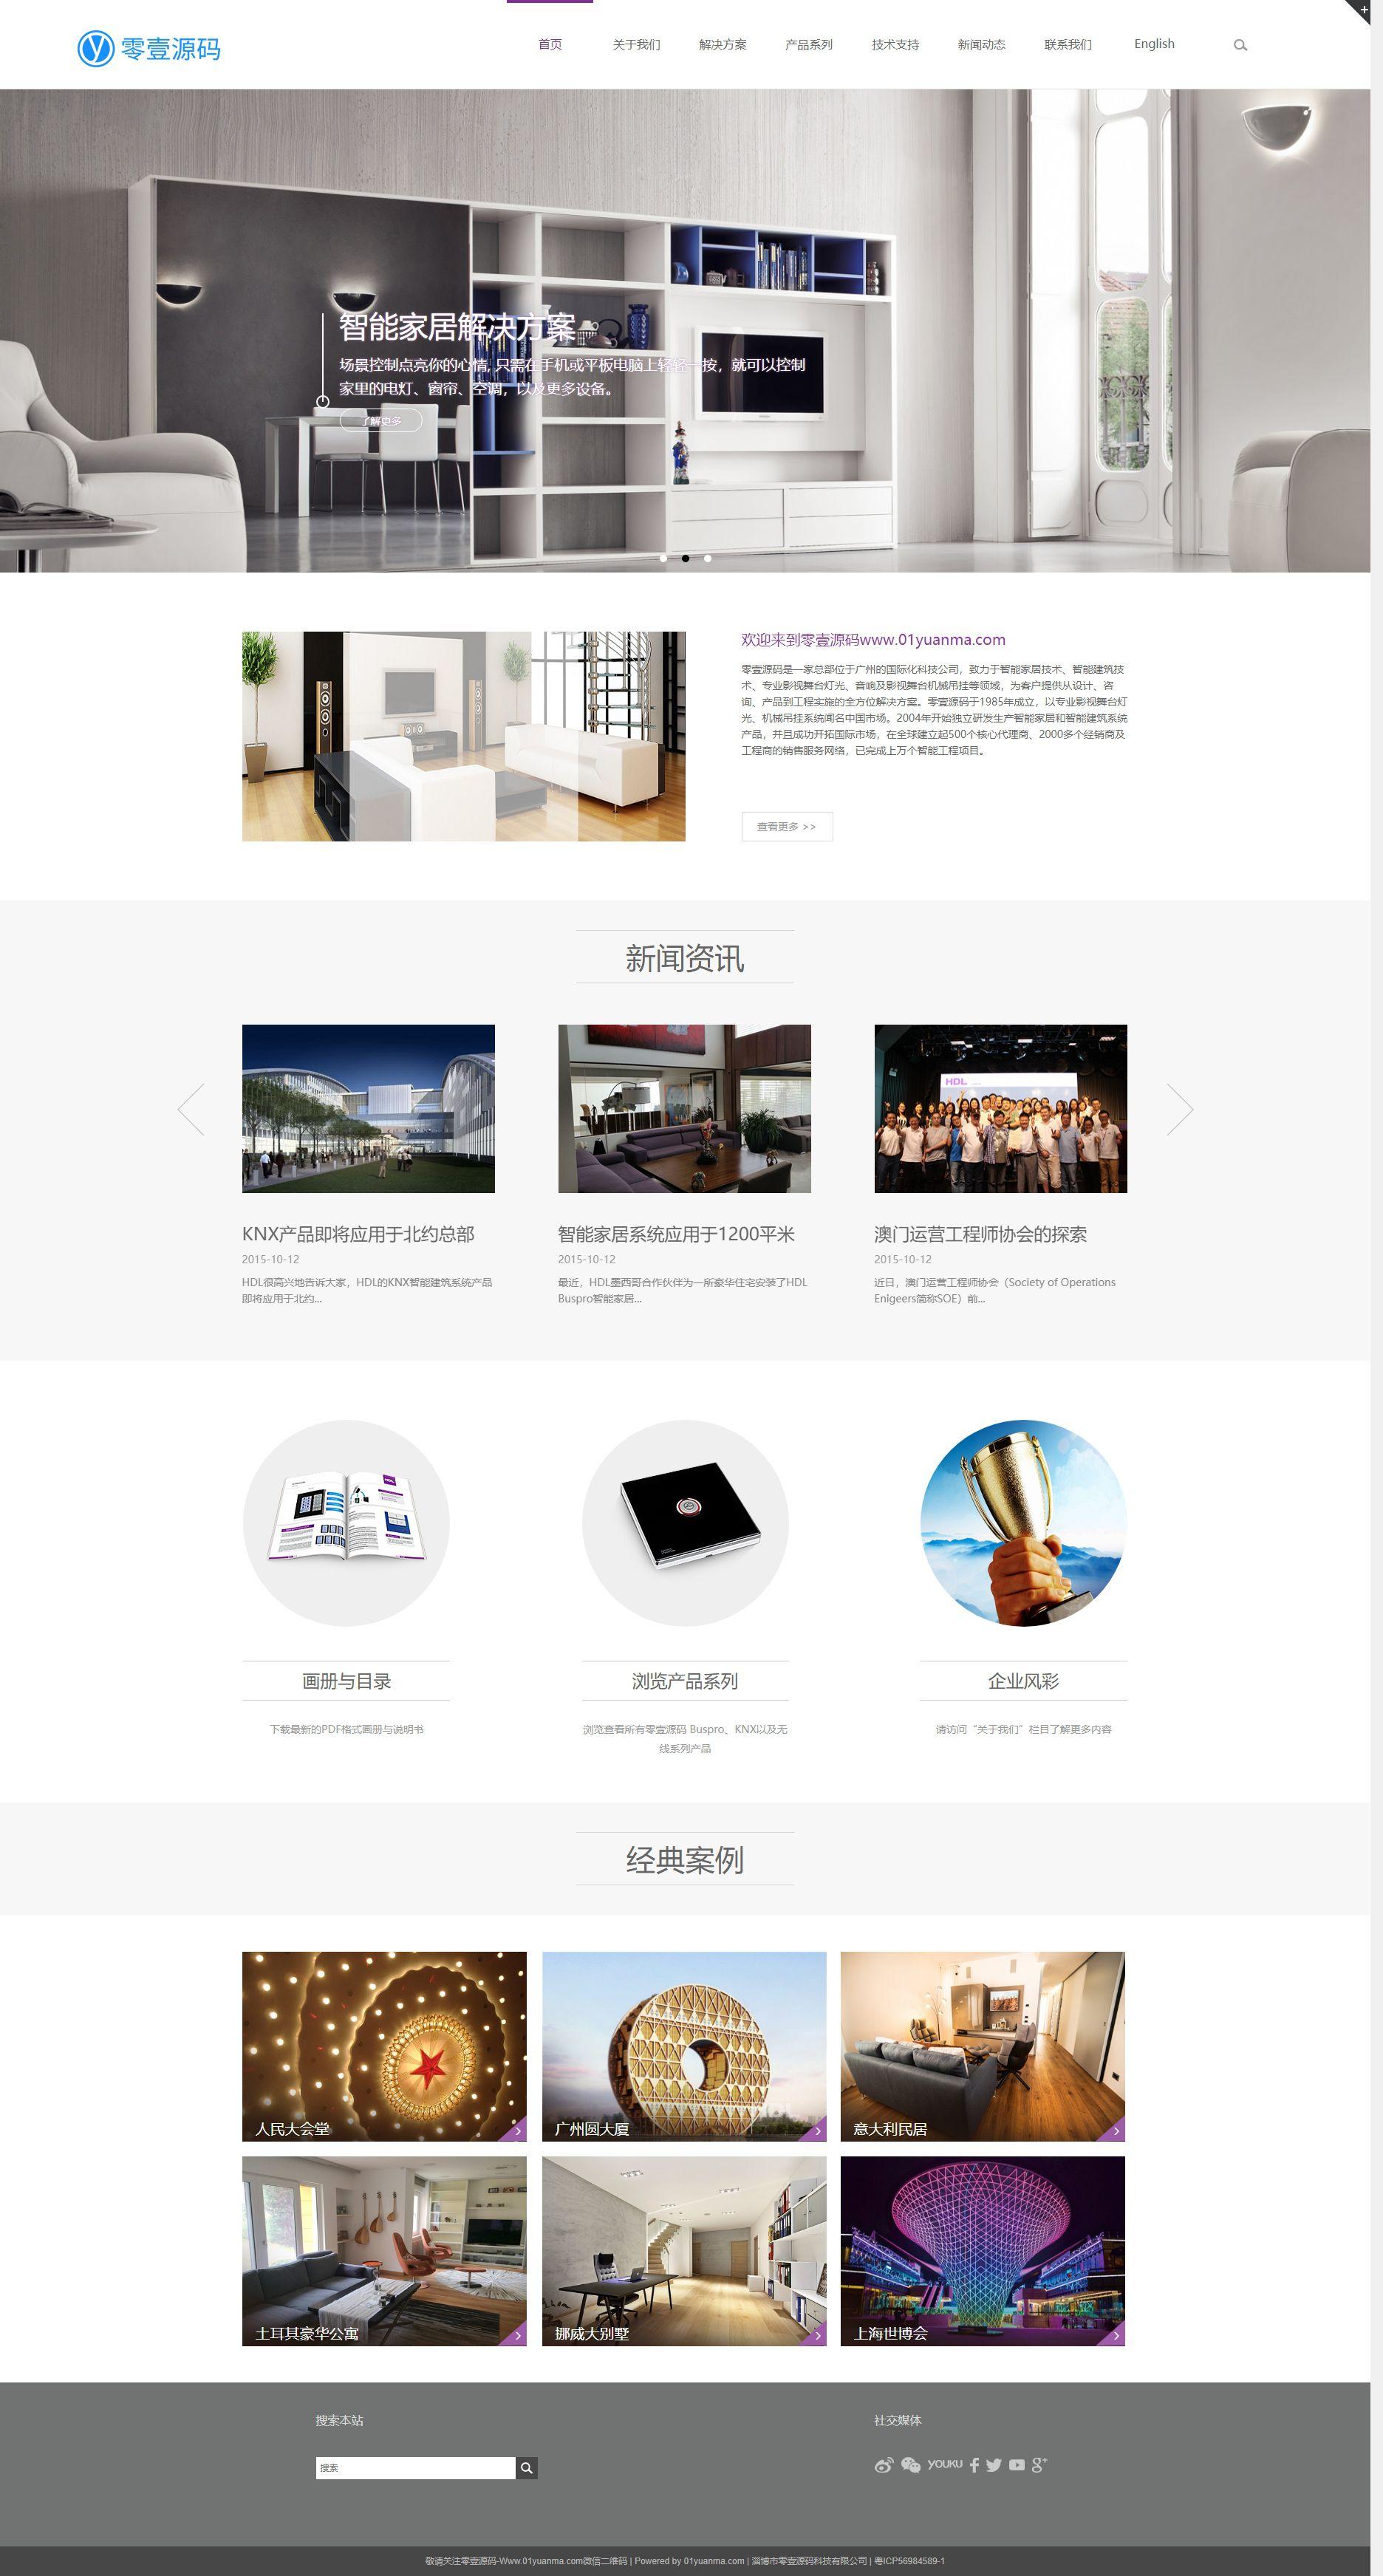 HTML5响应式自适应时尚家居产品展示网站dedecms建设(中英双语版)